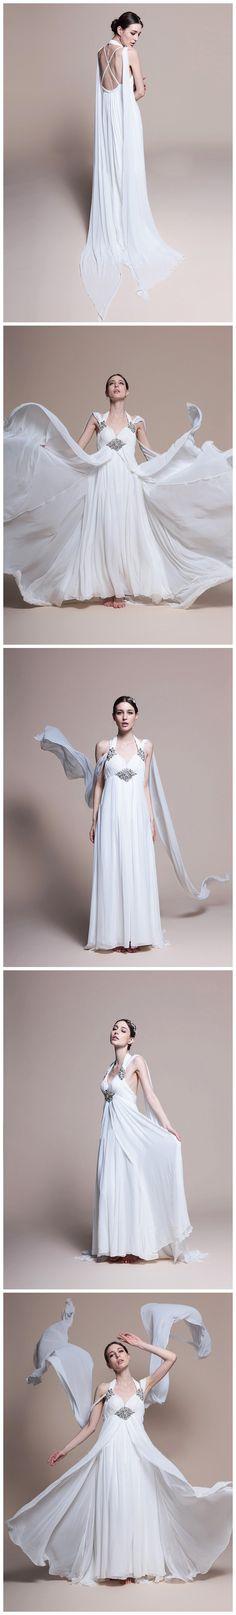 Flowly Halter Neck  Empire Waist Chiffon Wedding Dress